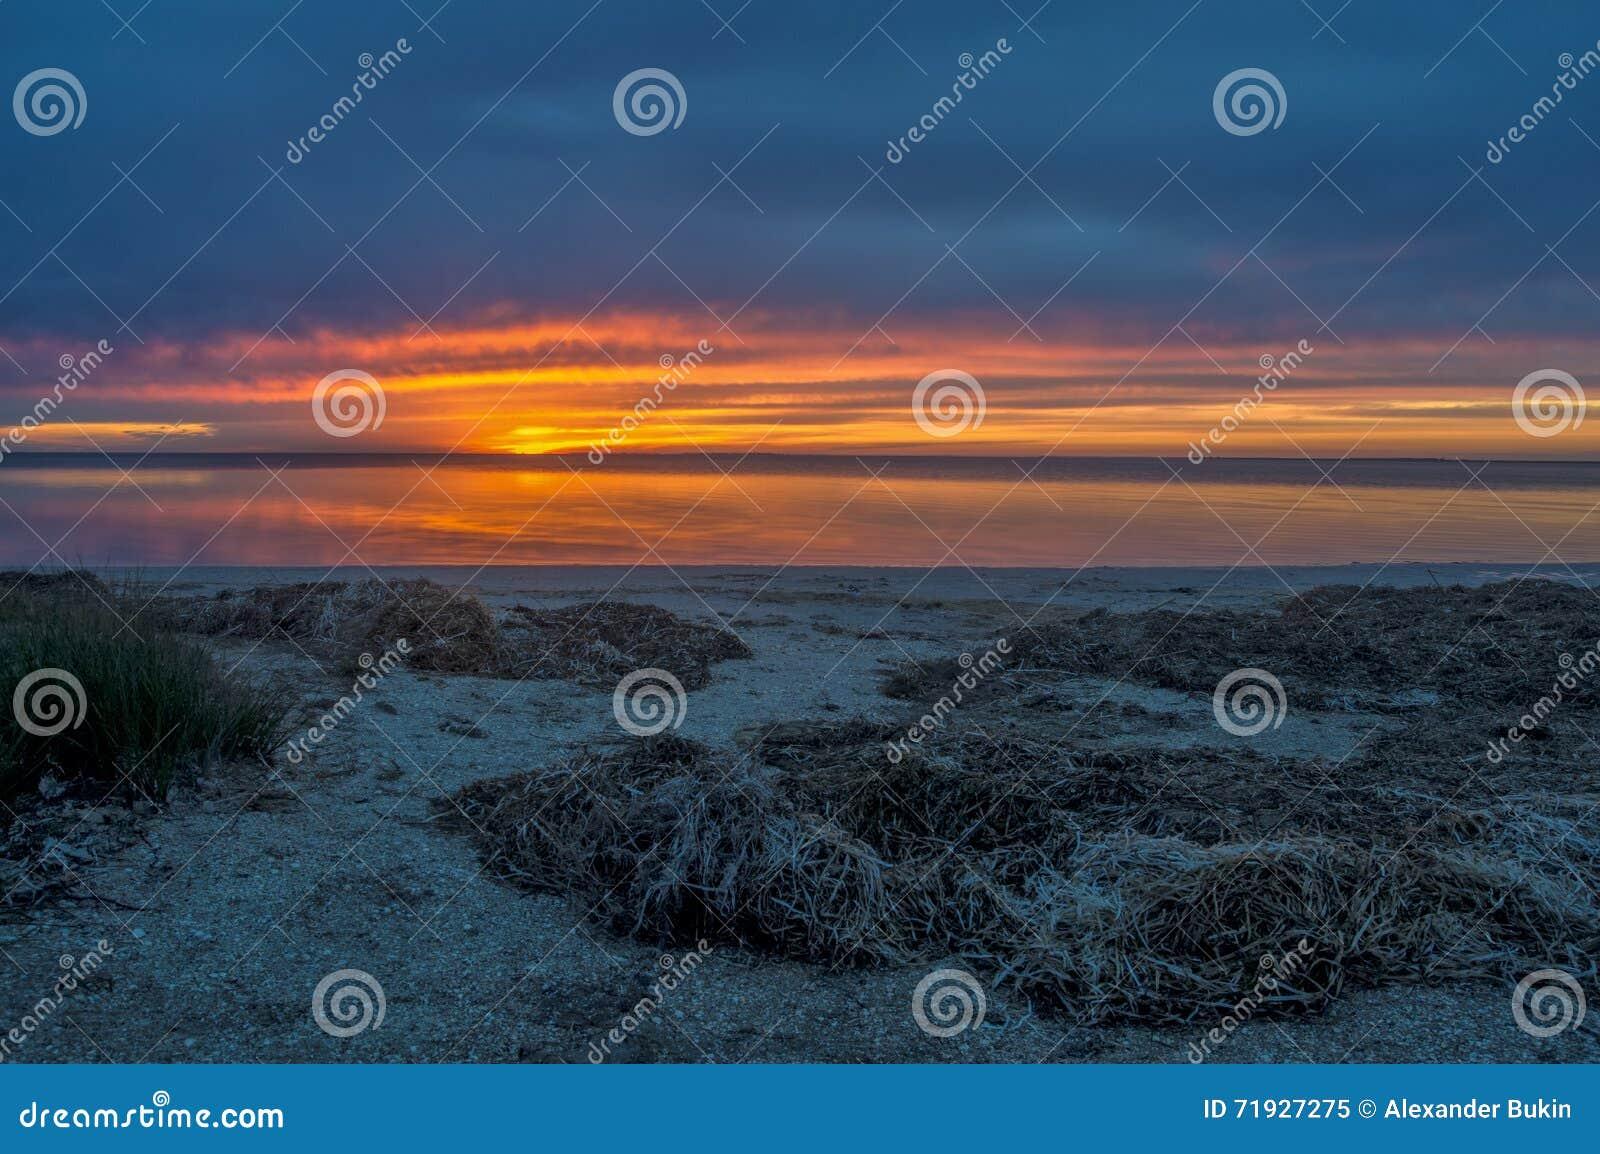 Красивый заход солнца, twilight море